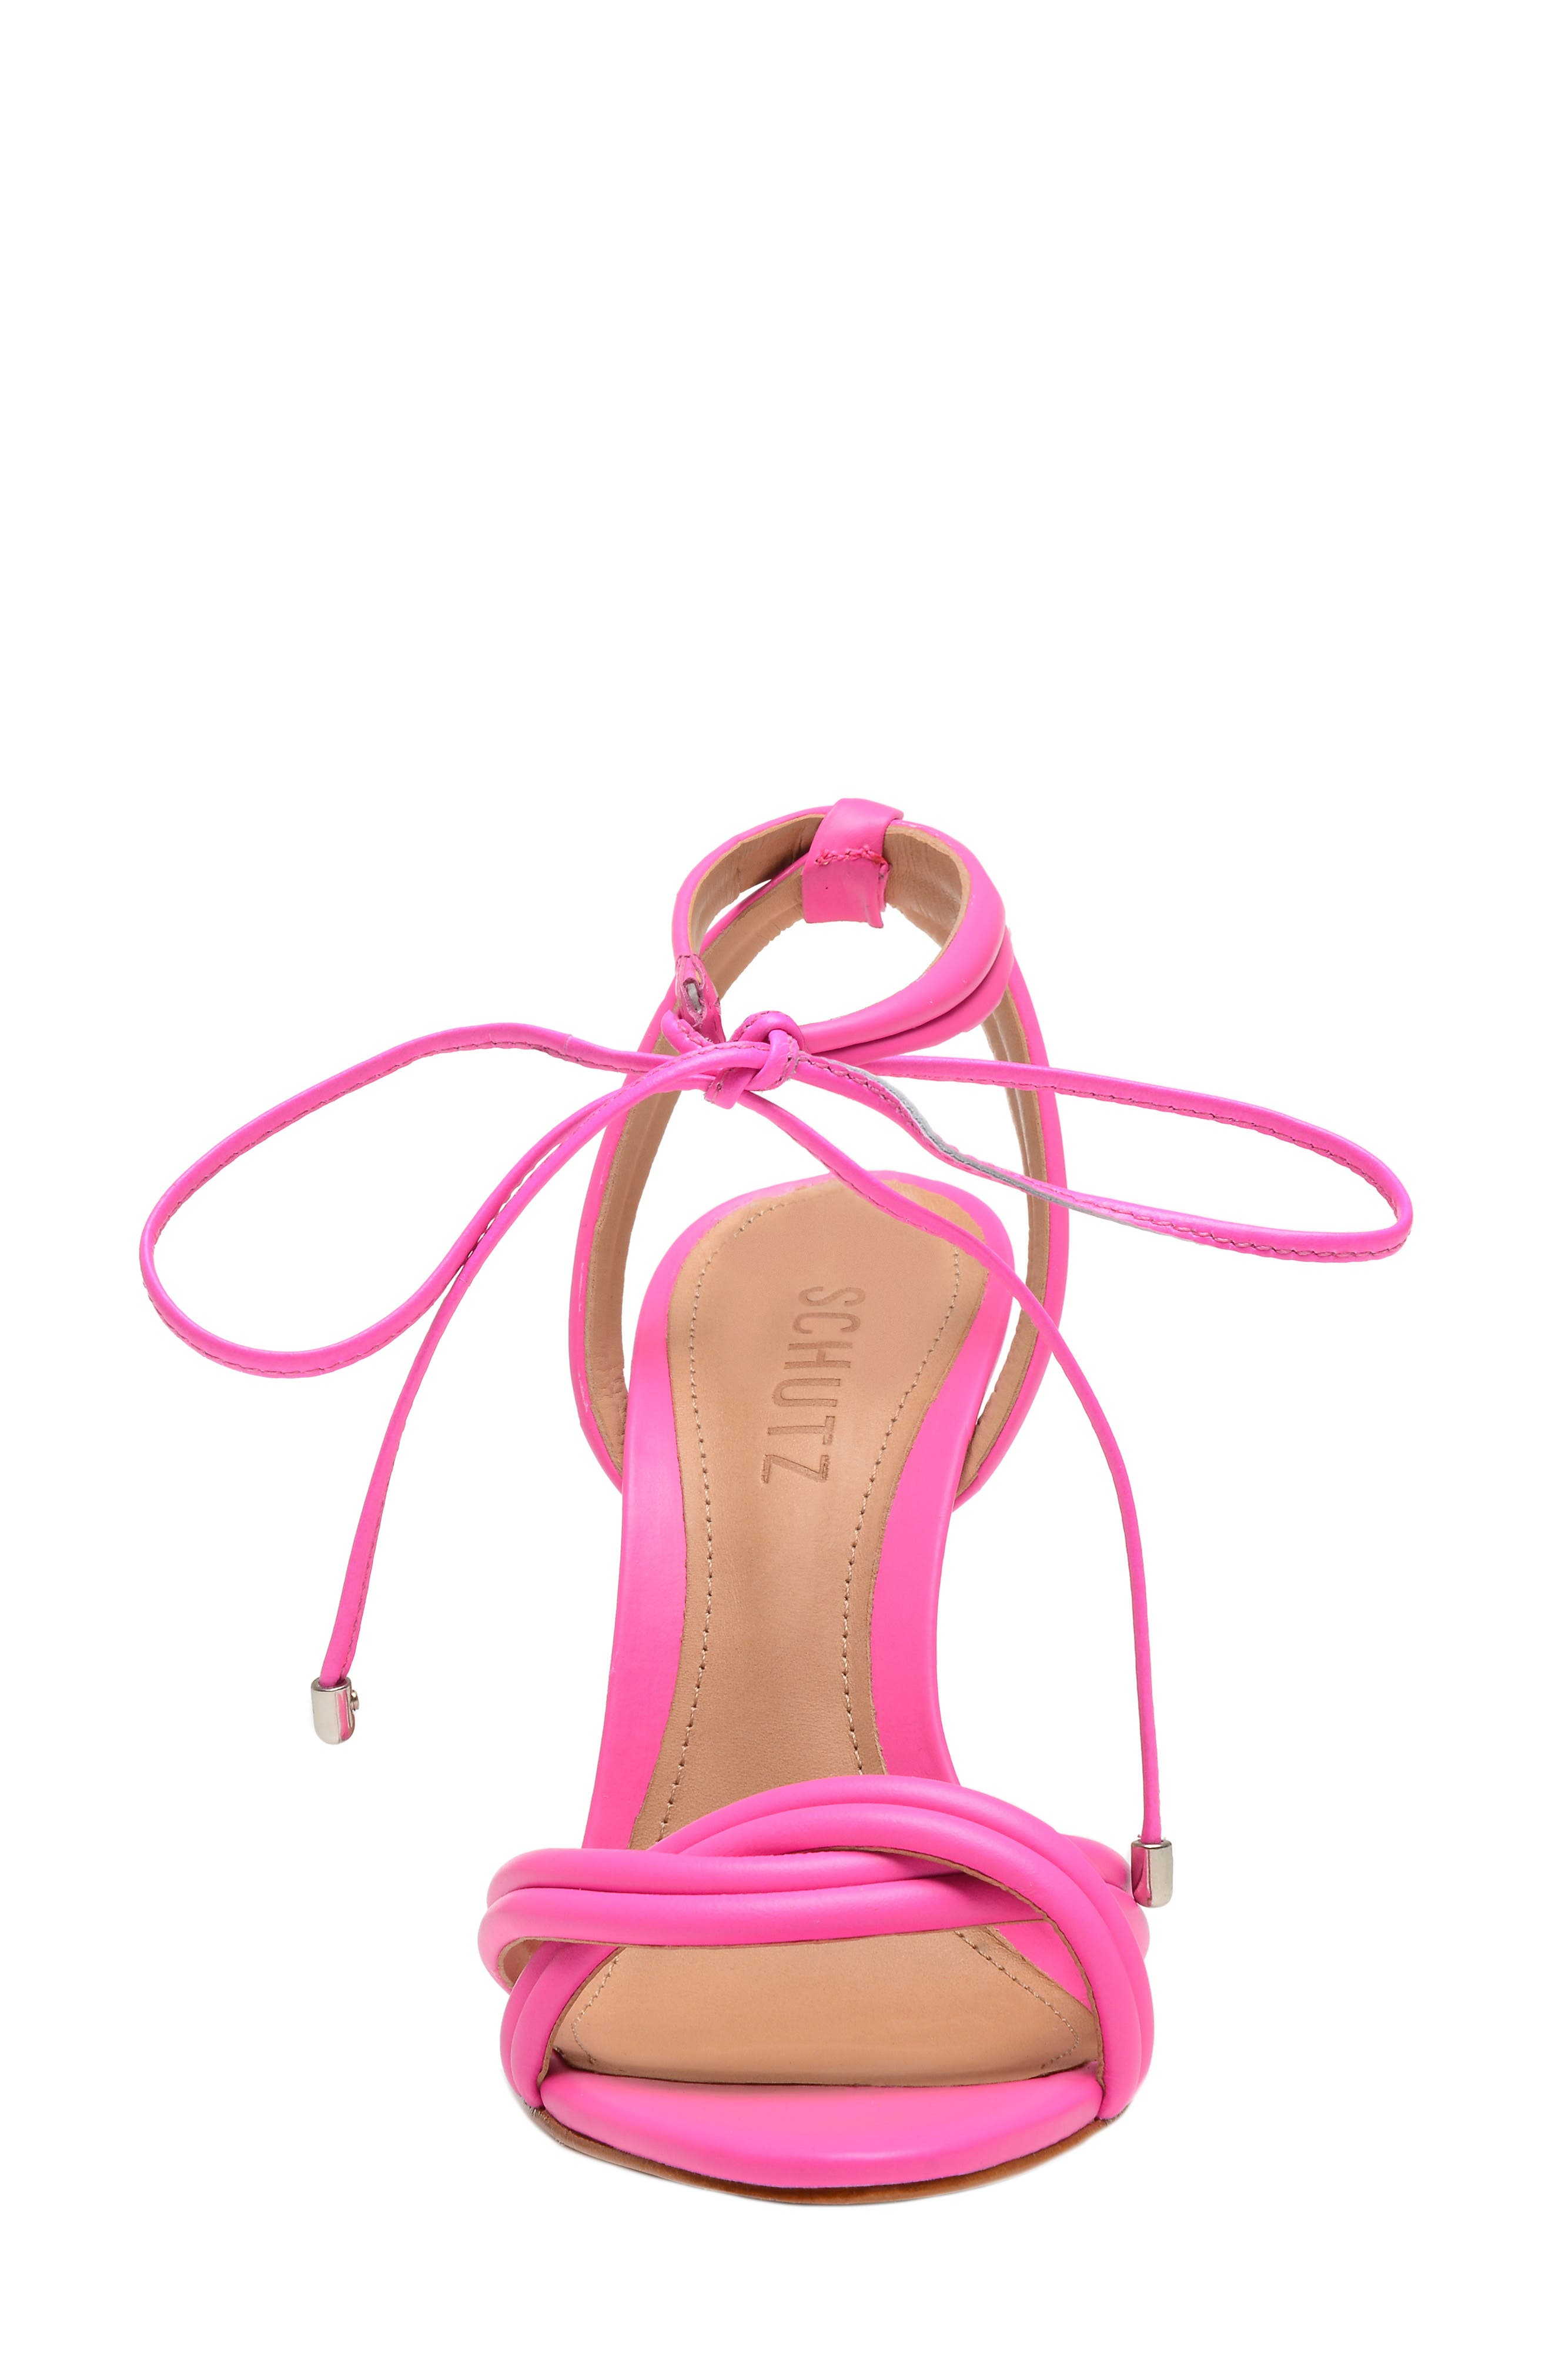 Yvi Strappy Sandal,                             Alternate thumbnail 4, color,                             NEON PINK